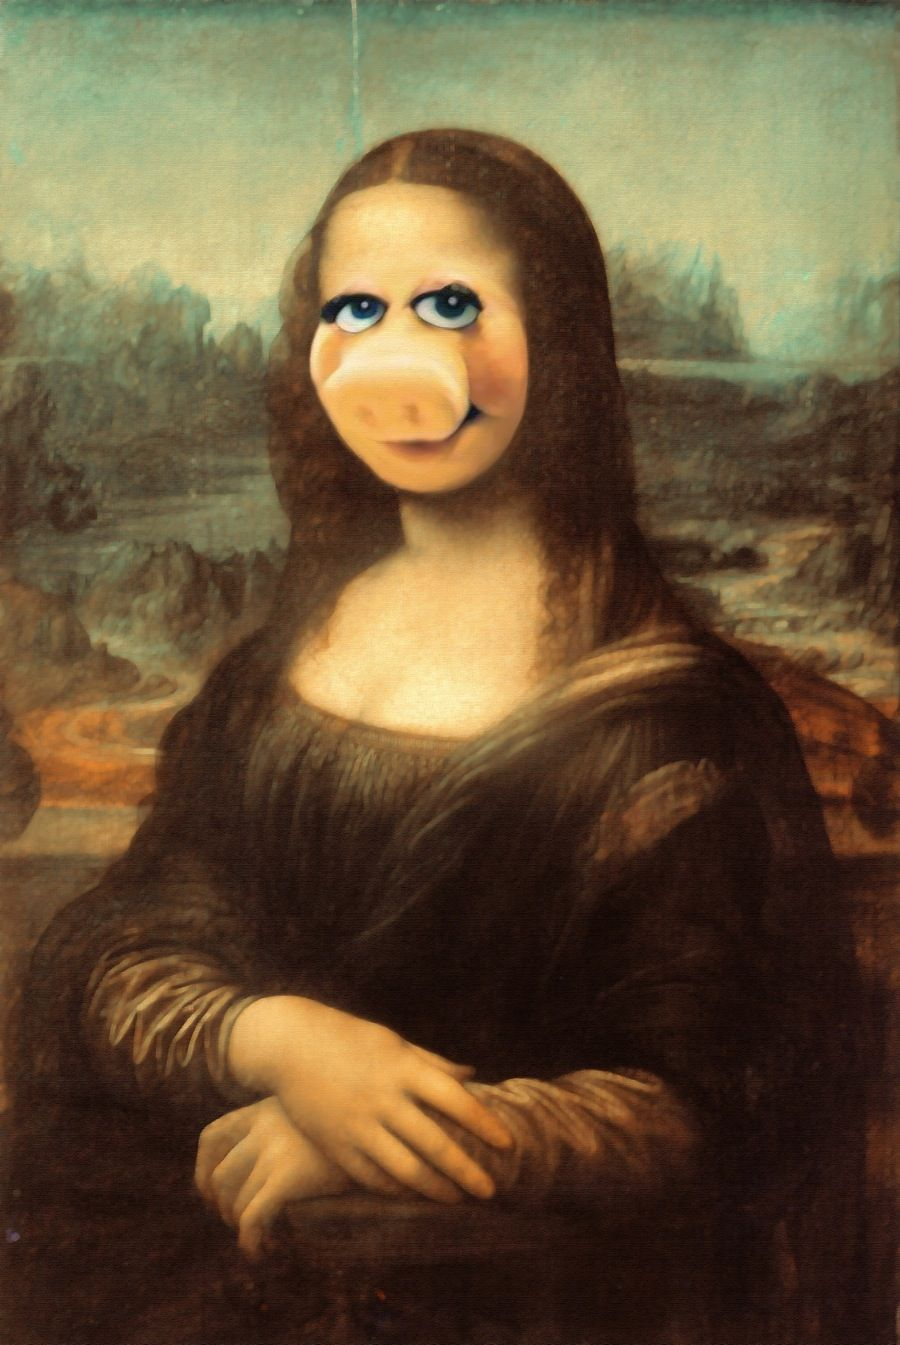 Miss Mona Piggy by SuperDuperCookie